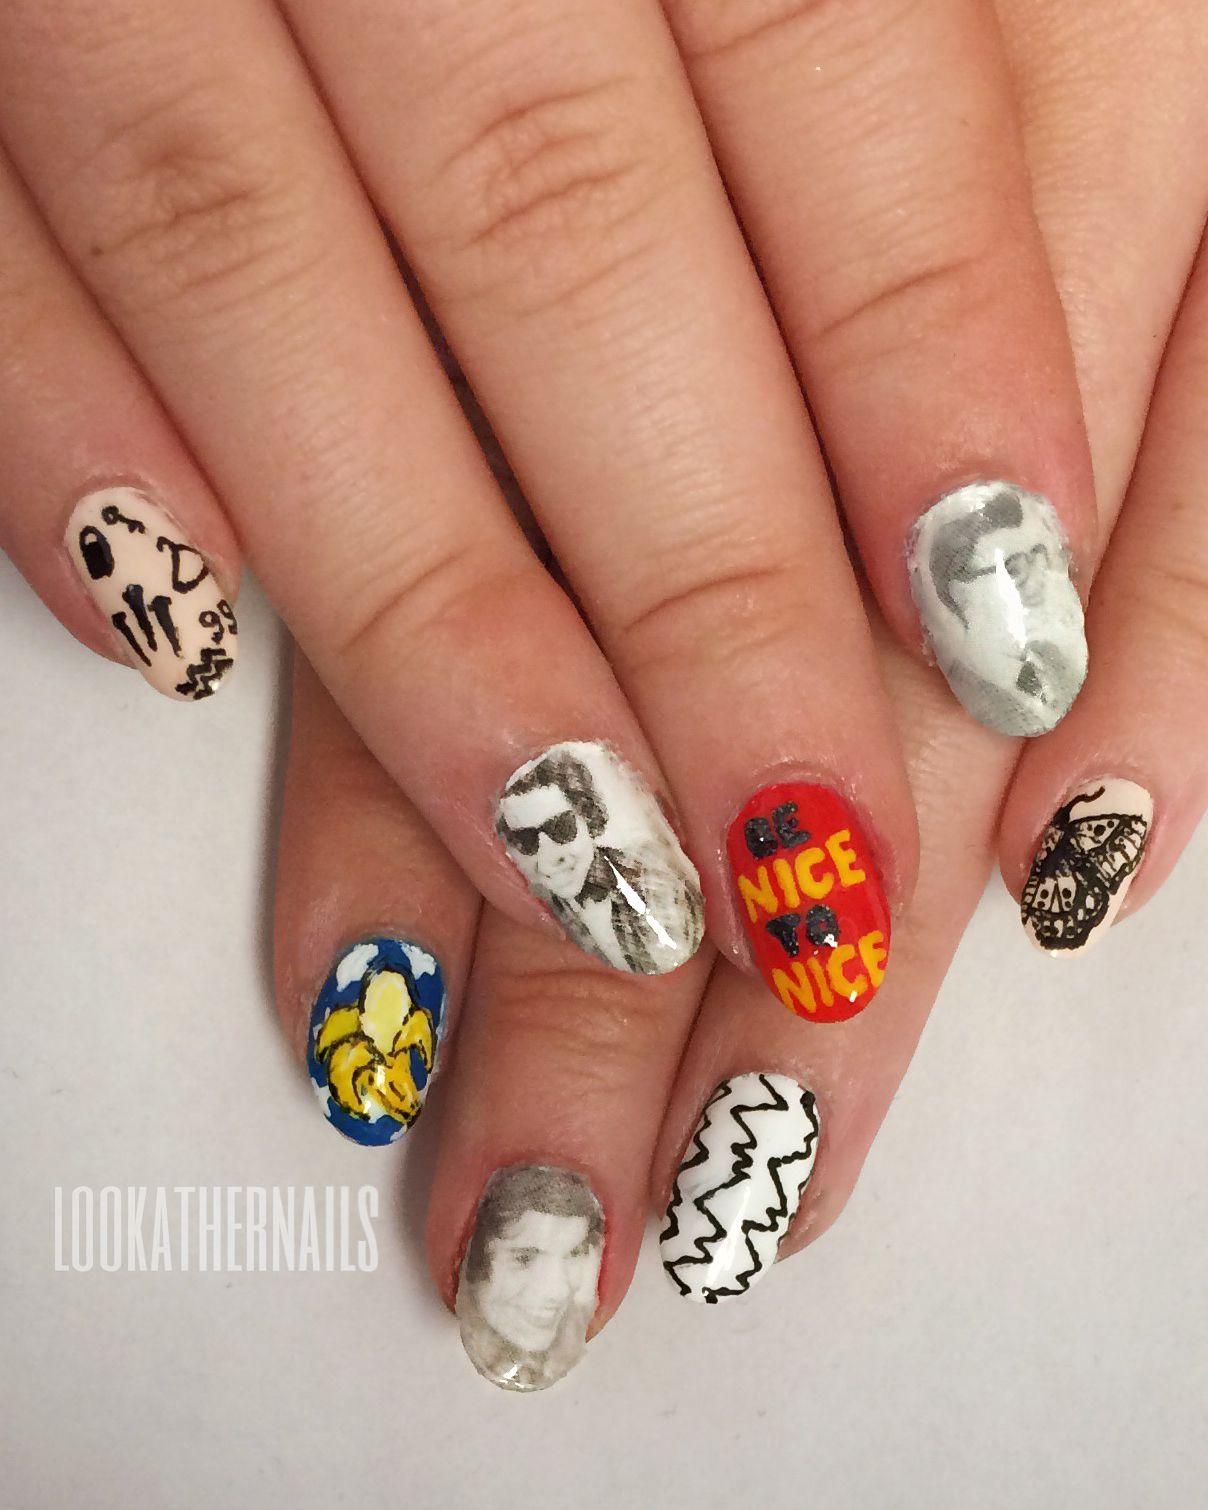 Look At Her Nails Tattoo Paper Cute Acrylic Nails Nails